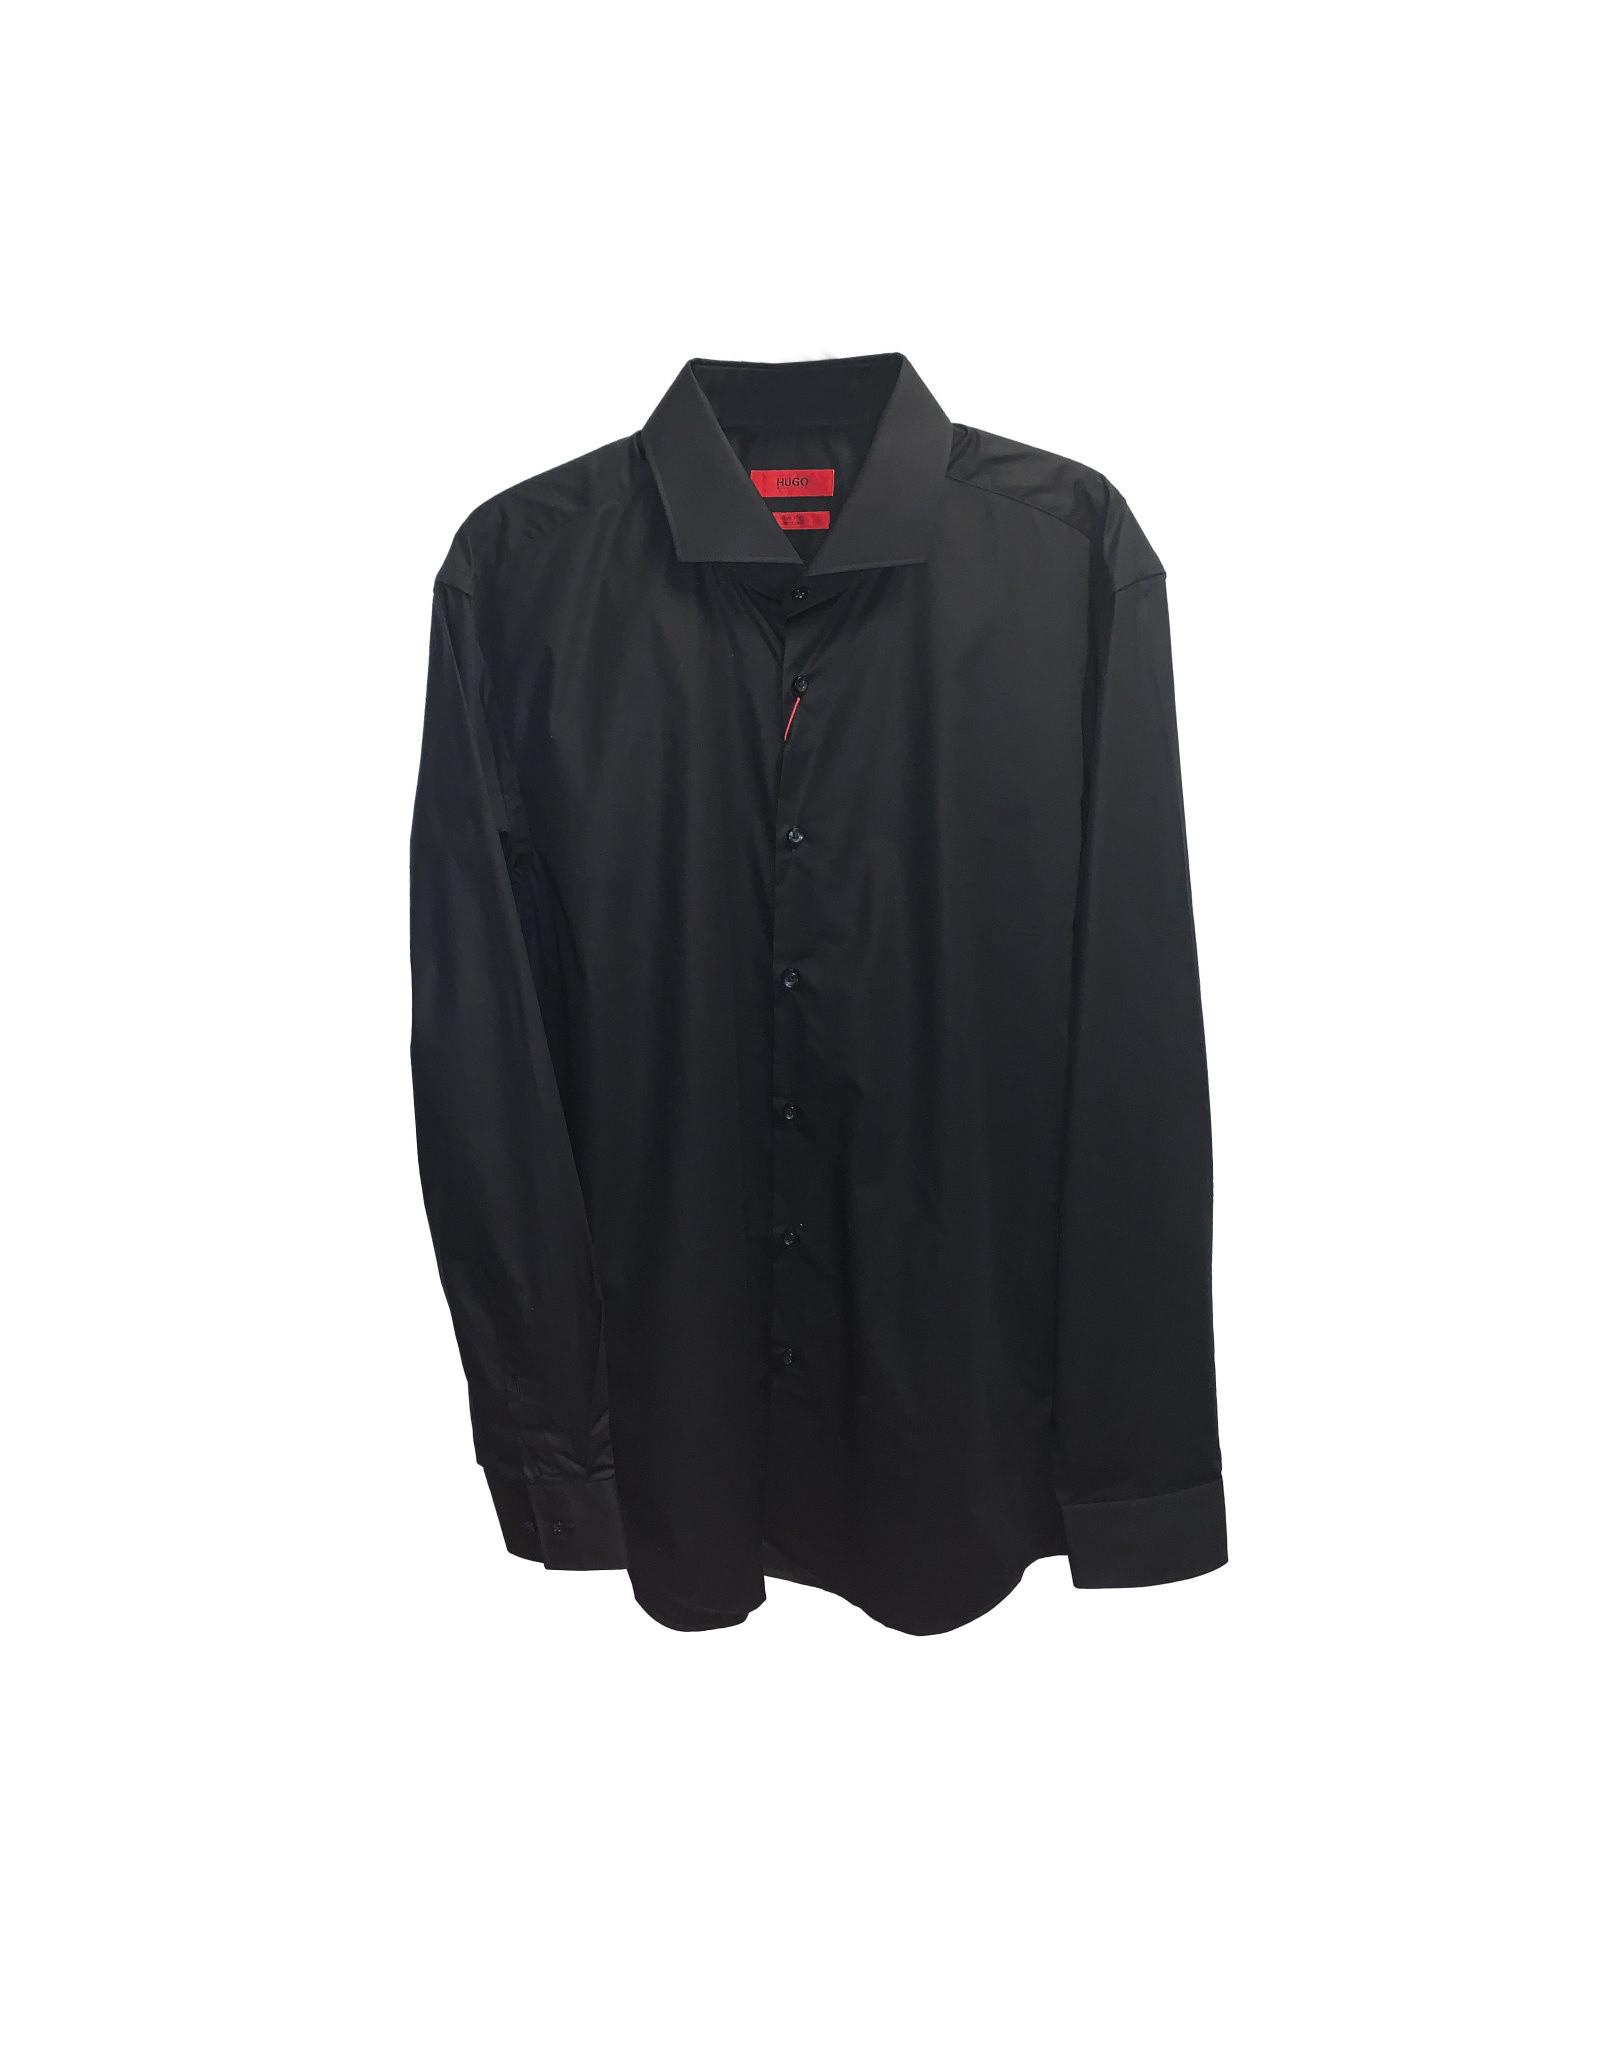 HUGO Hugo Slim   Fit Dress  Shirt  Size 42